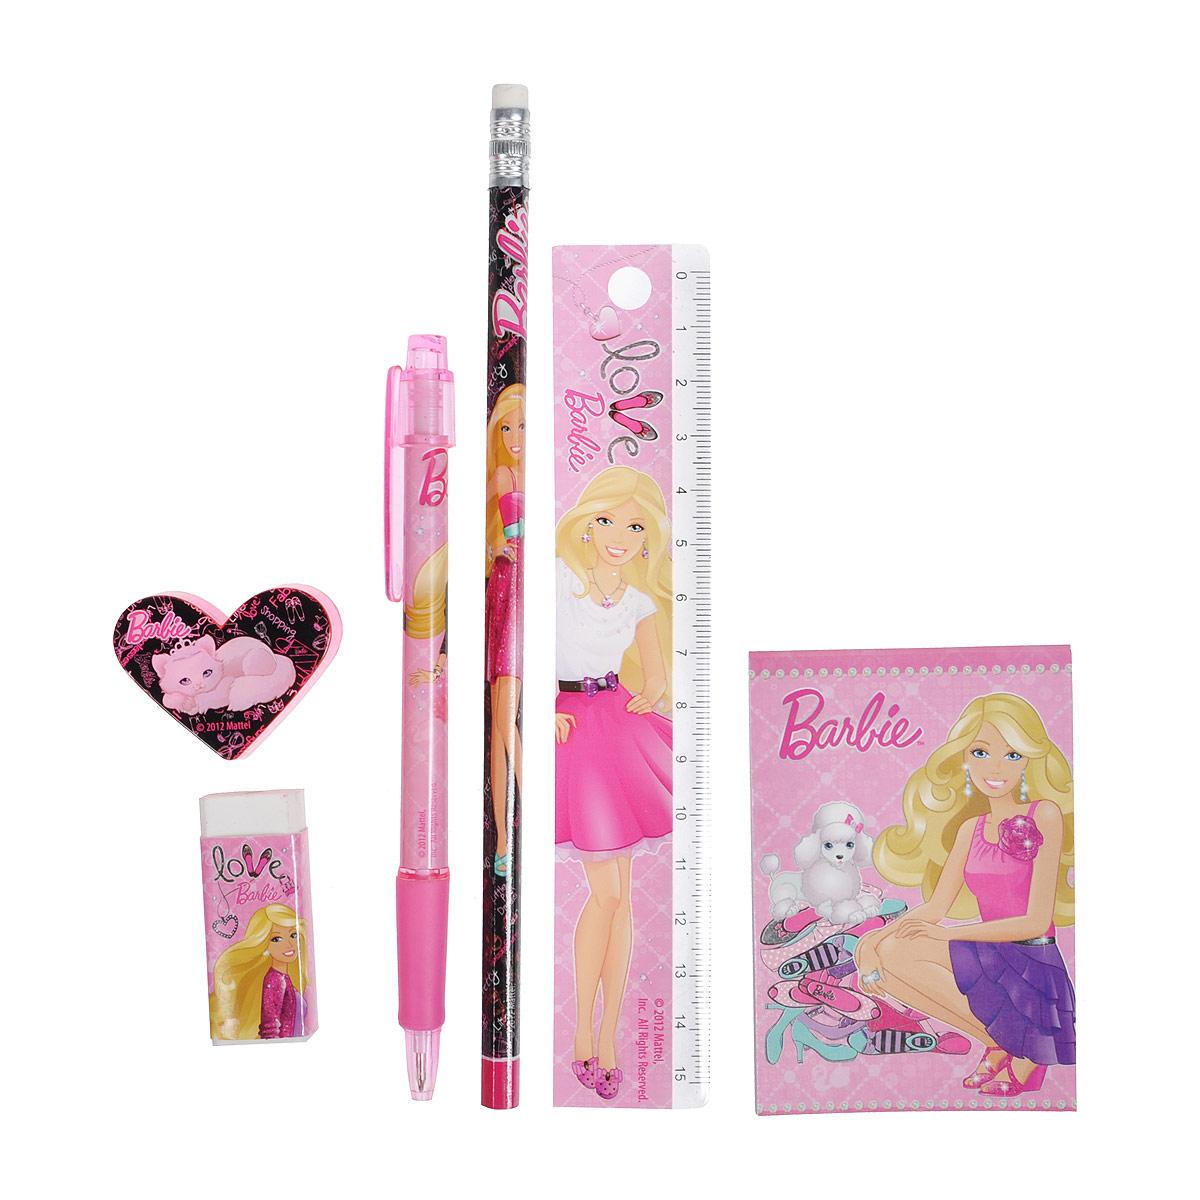 Канцелярский набор  Barbie , 7 предметов -  Канцелярские наборы